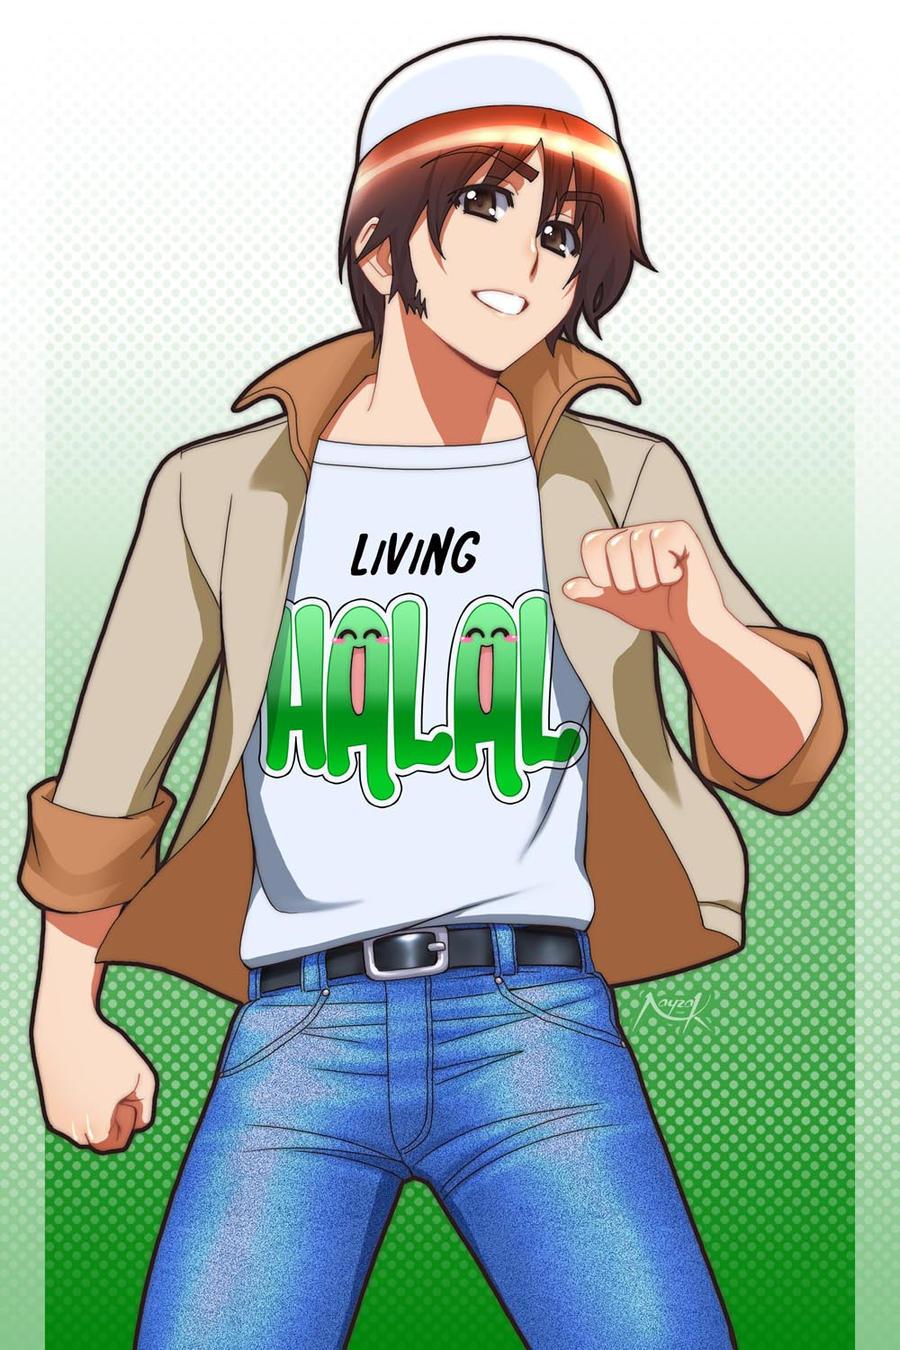 Anime Muslim Lelaki Living Halal By Nayzak On Deviantart